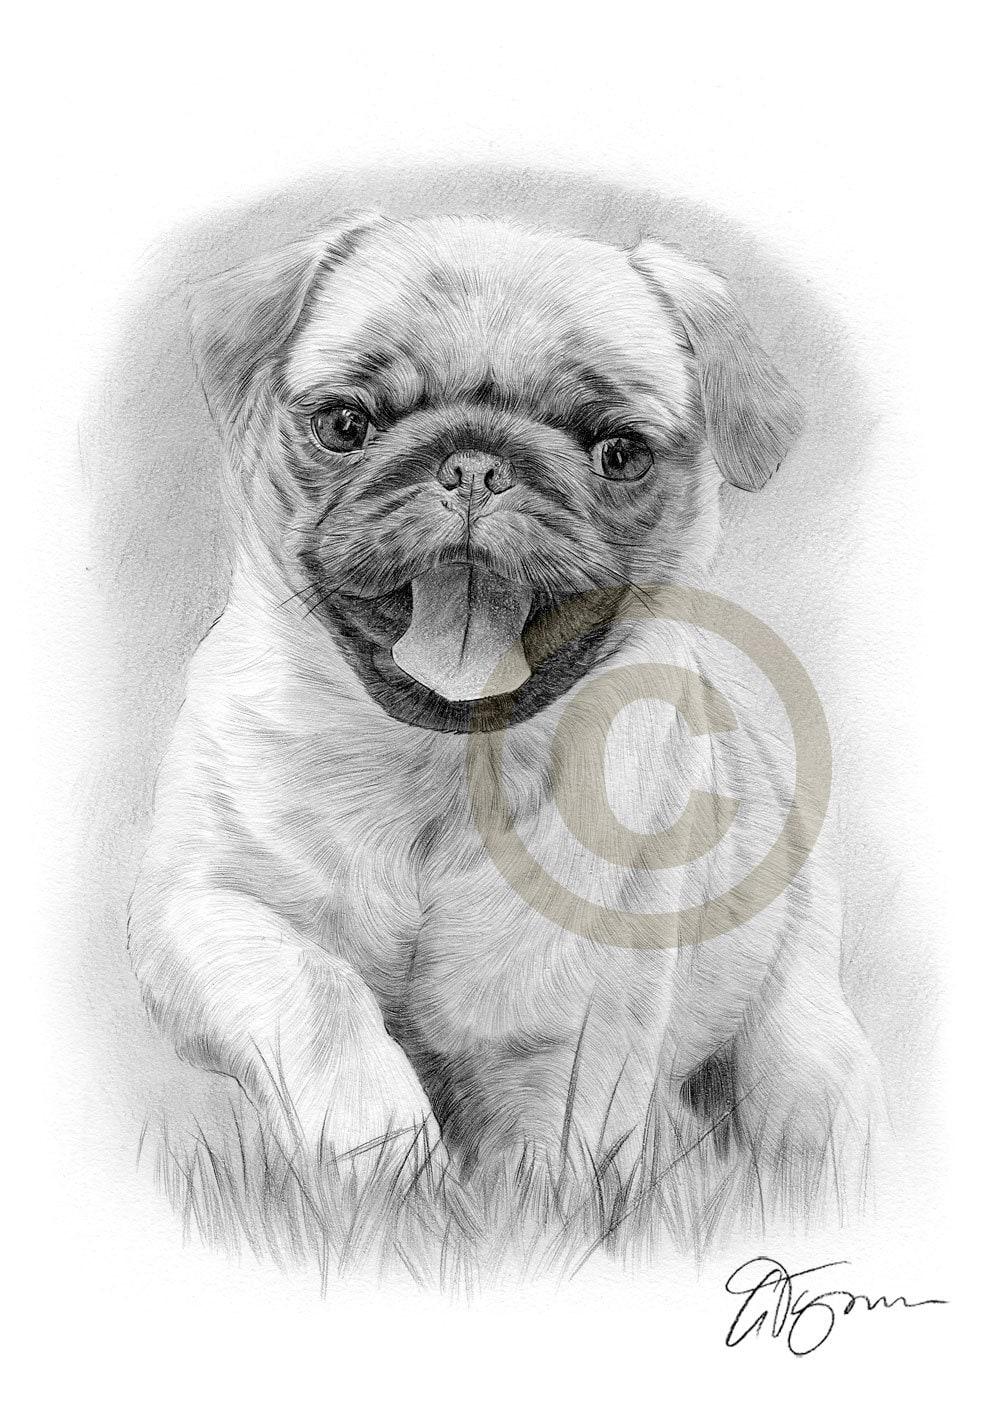 pug puppy running through grass pencil drawing print a4 size